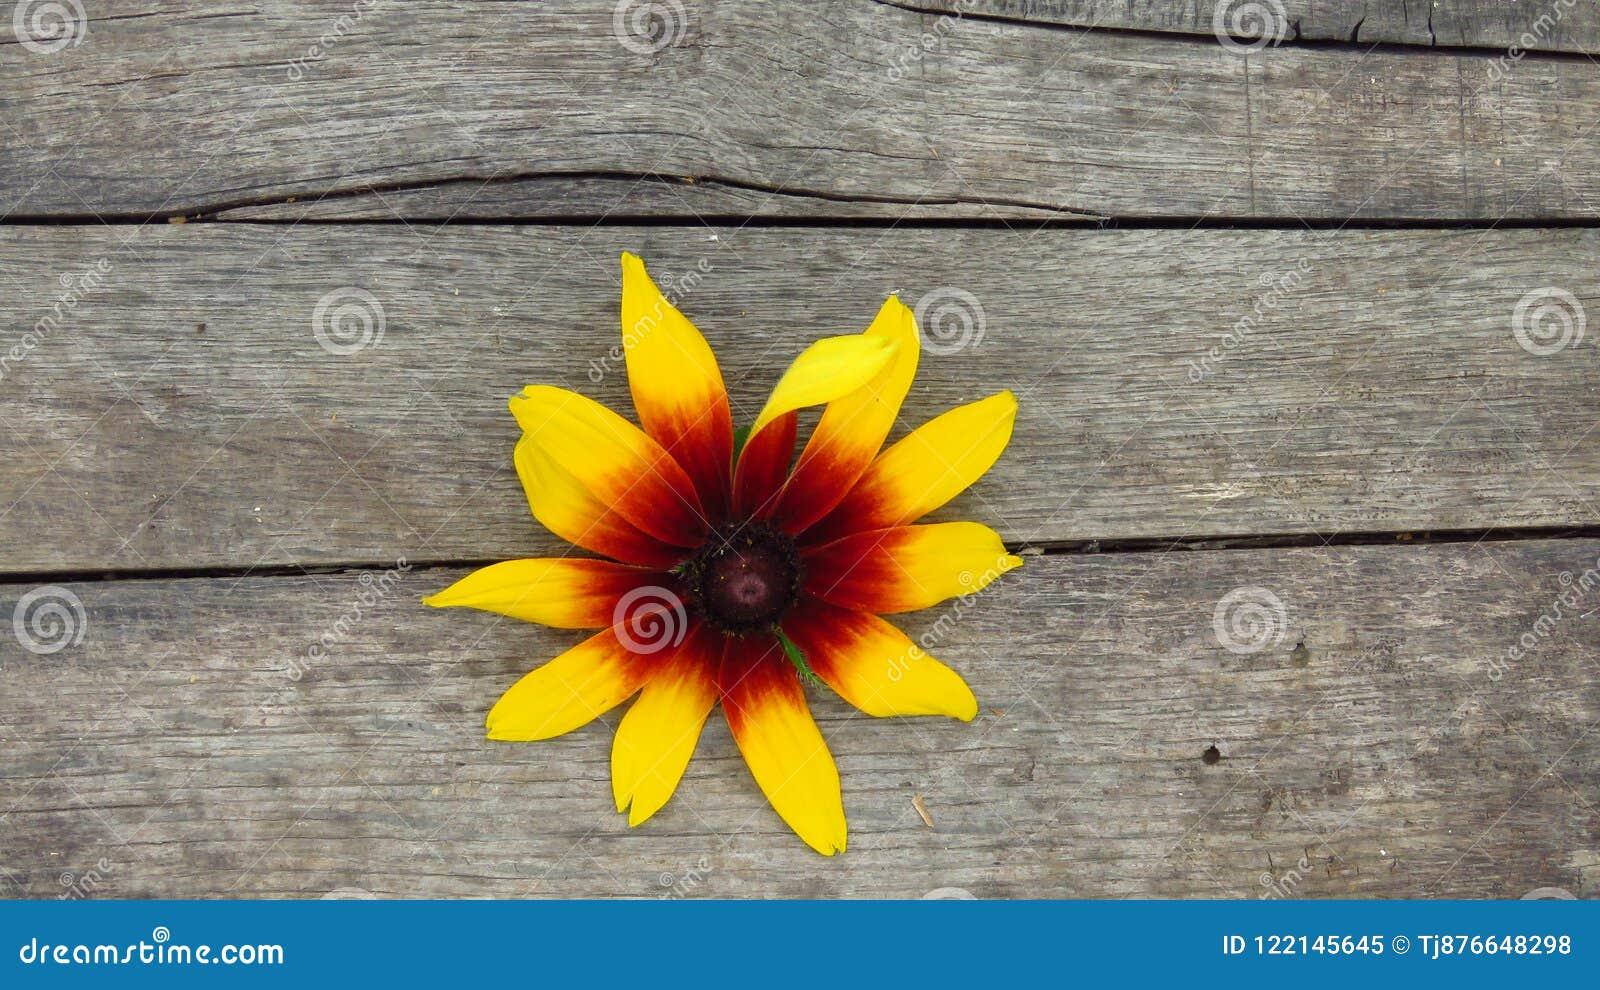 Rudbeckia hirta. Gazania. Isolated Black-eyed Susan. Beautiful Yellow Flower on Wooden Background.